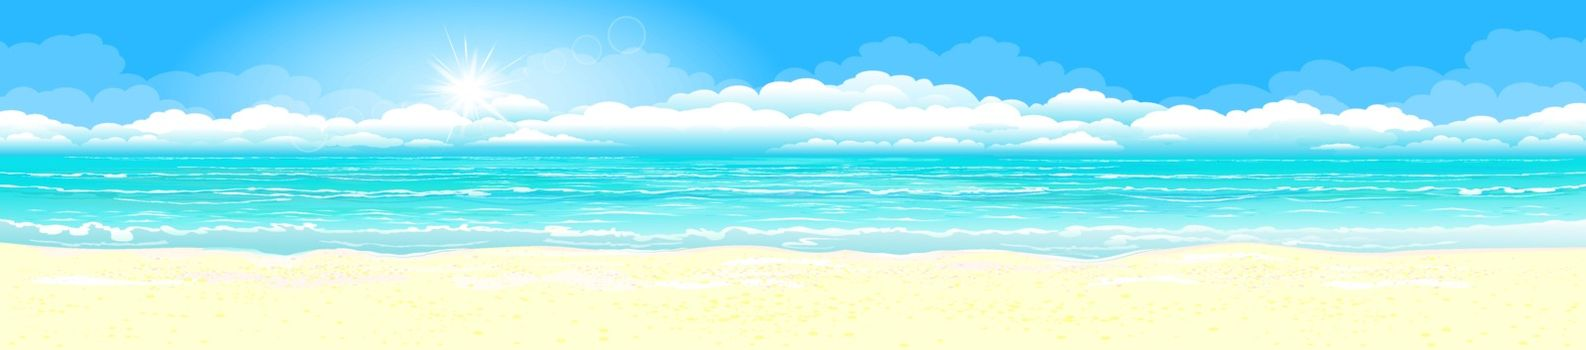 Sandy coast of the azure ocean